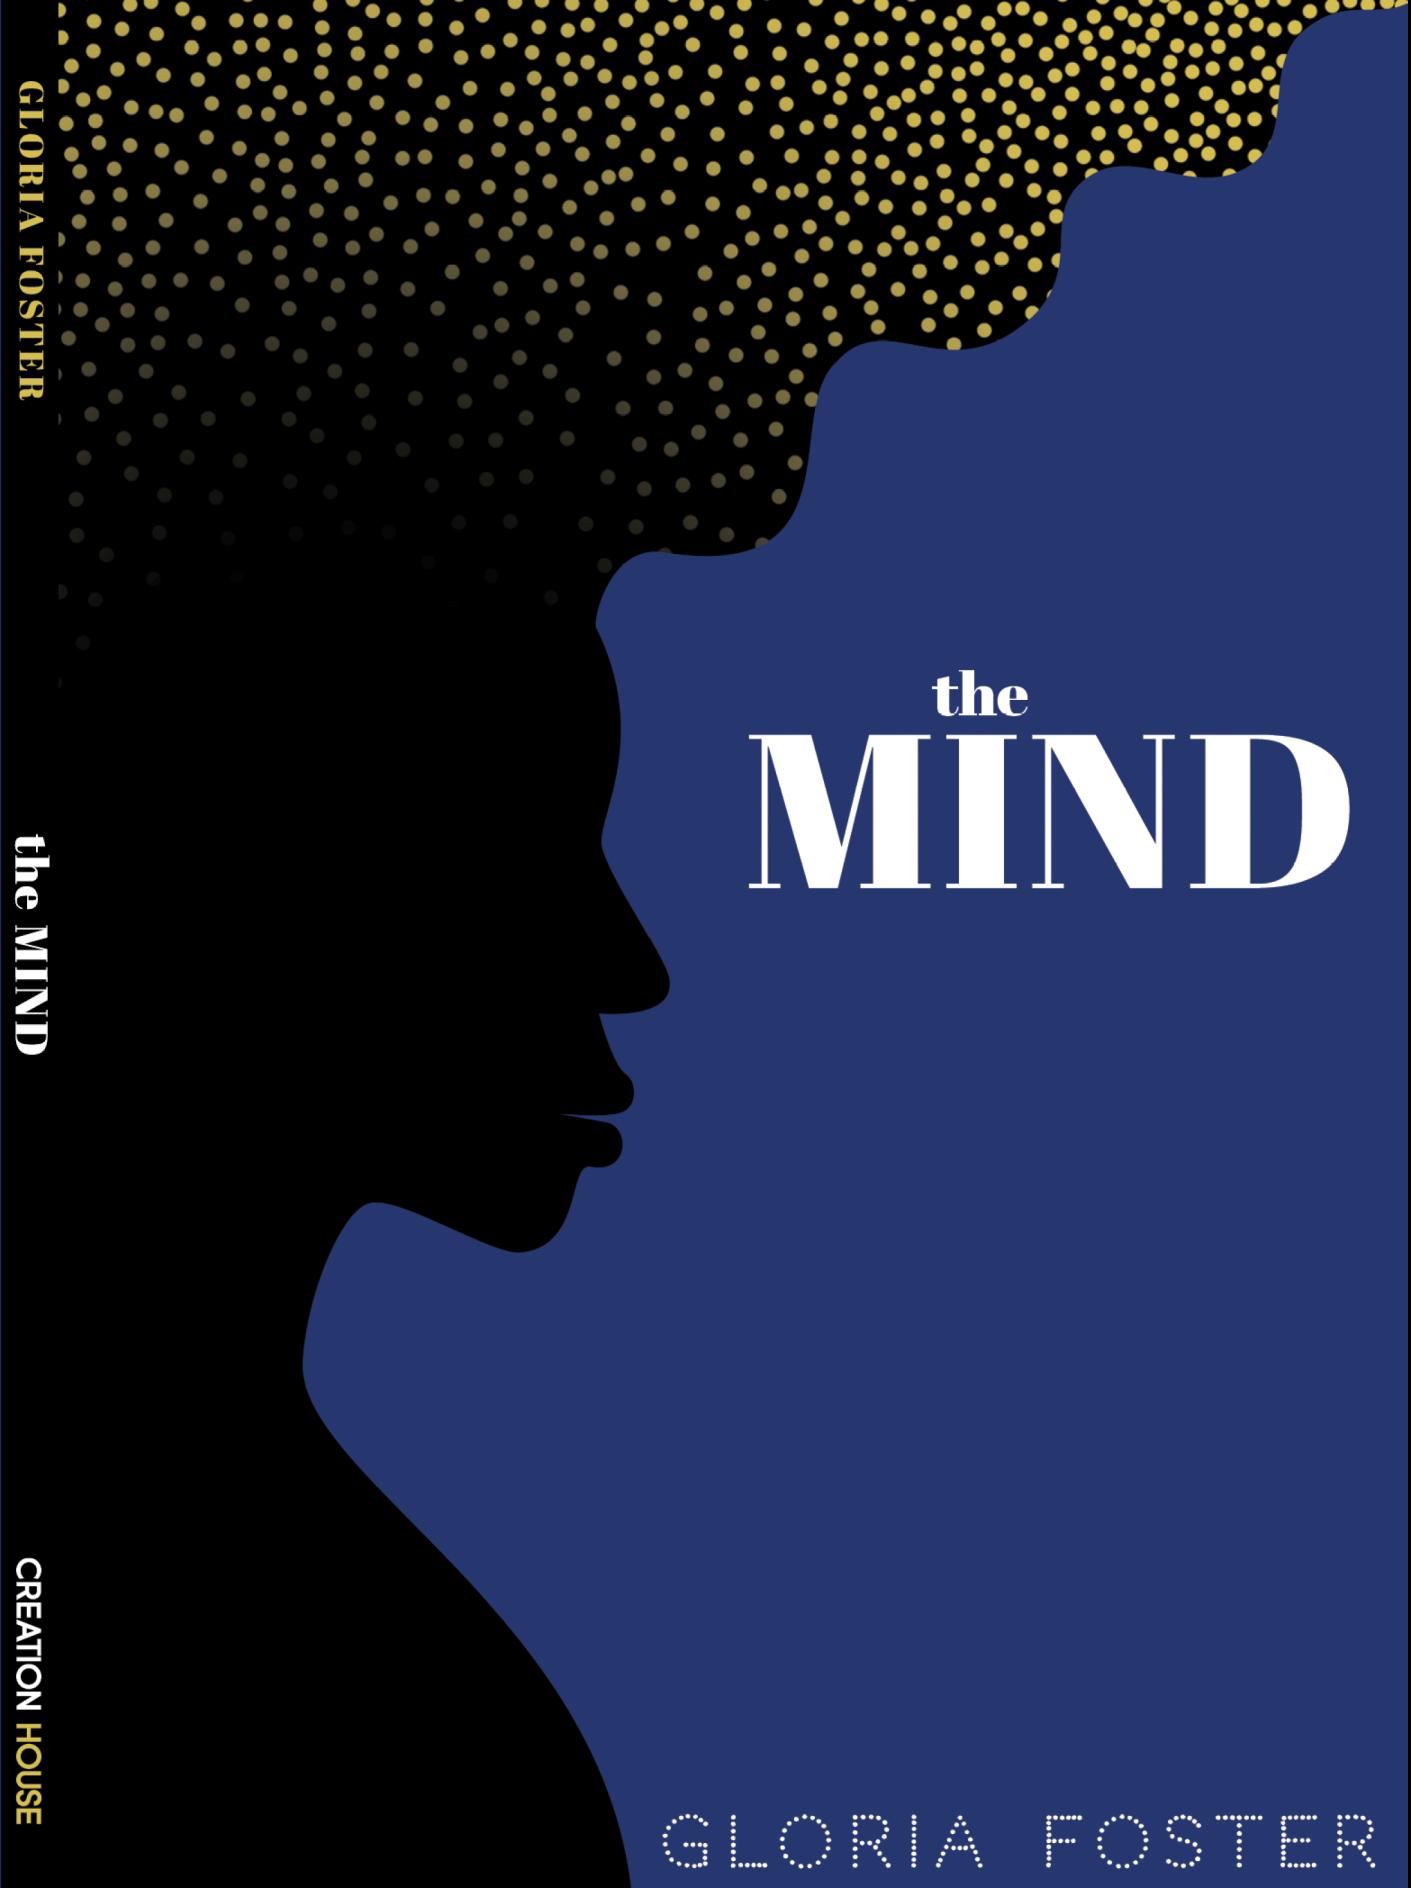 Novel, book, fiction, suspense, thriller, african american, women, psychological thriller